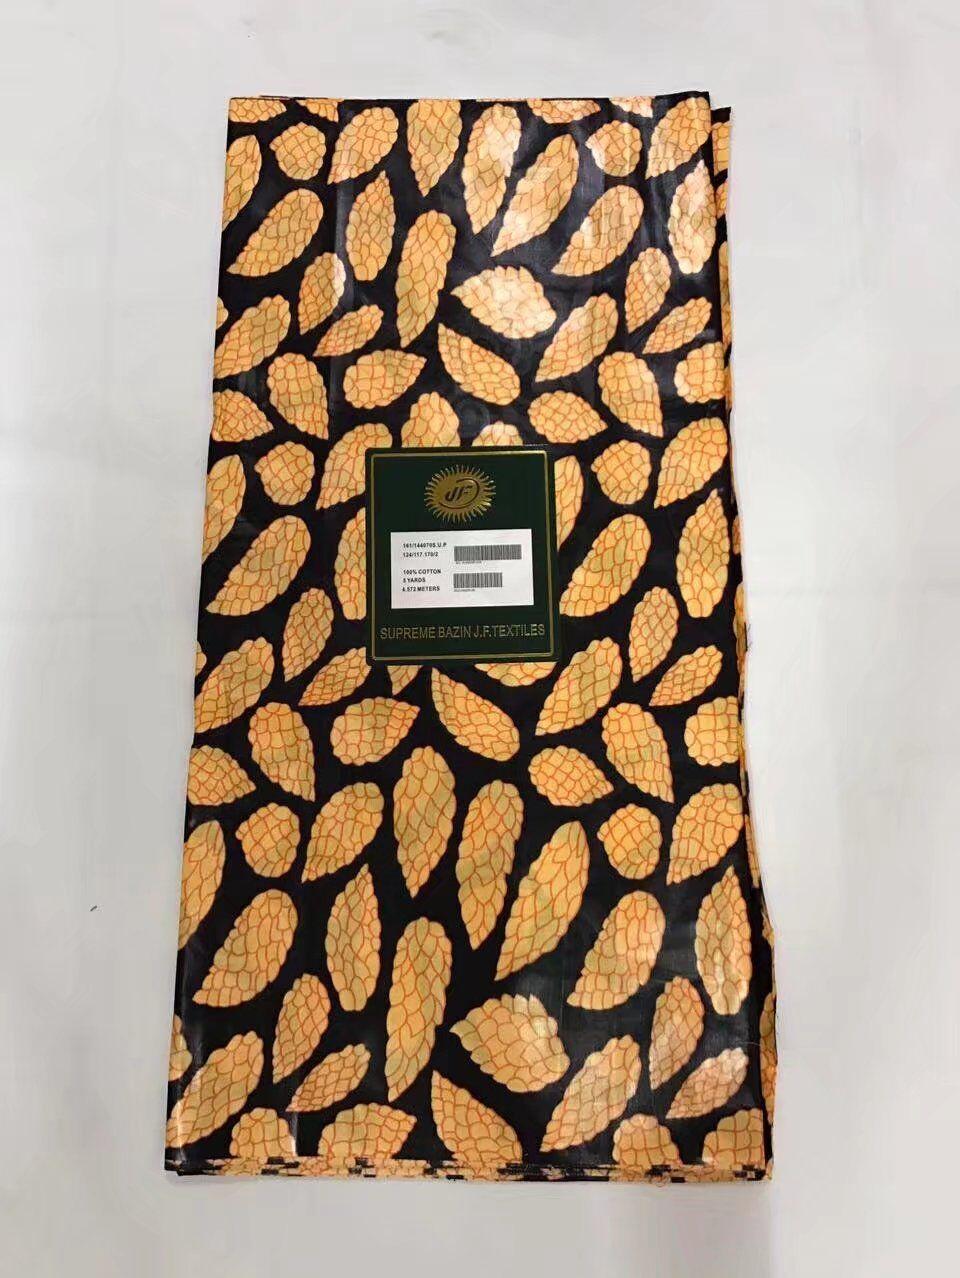 100 % cotton Beautiful design prints supreme bazin riche textiles 5 yards High quality multicolor jacquard brocade fabric!O-1103 ...